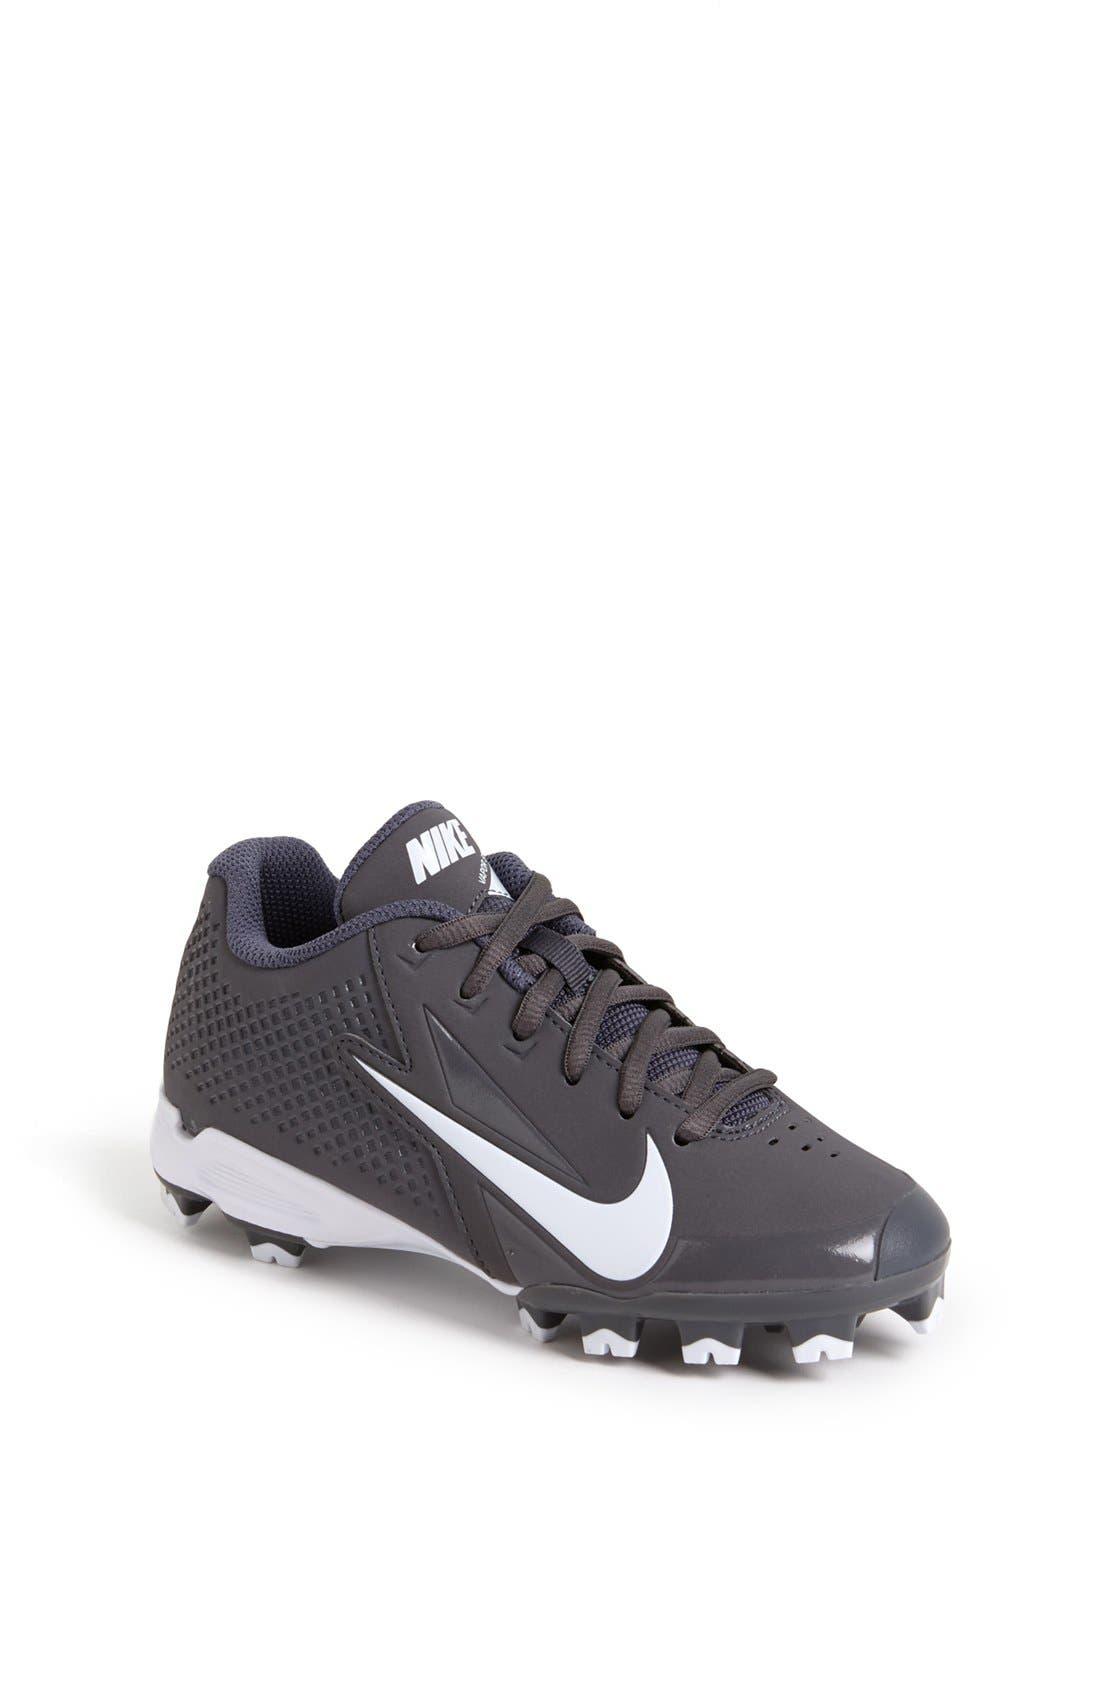 Main Image - Nike 'Vapor Strike' Baseball Shoe (Little Kid & Big Kid)